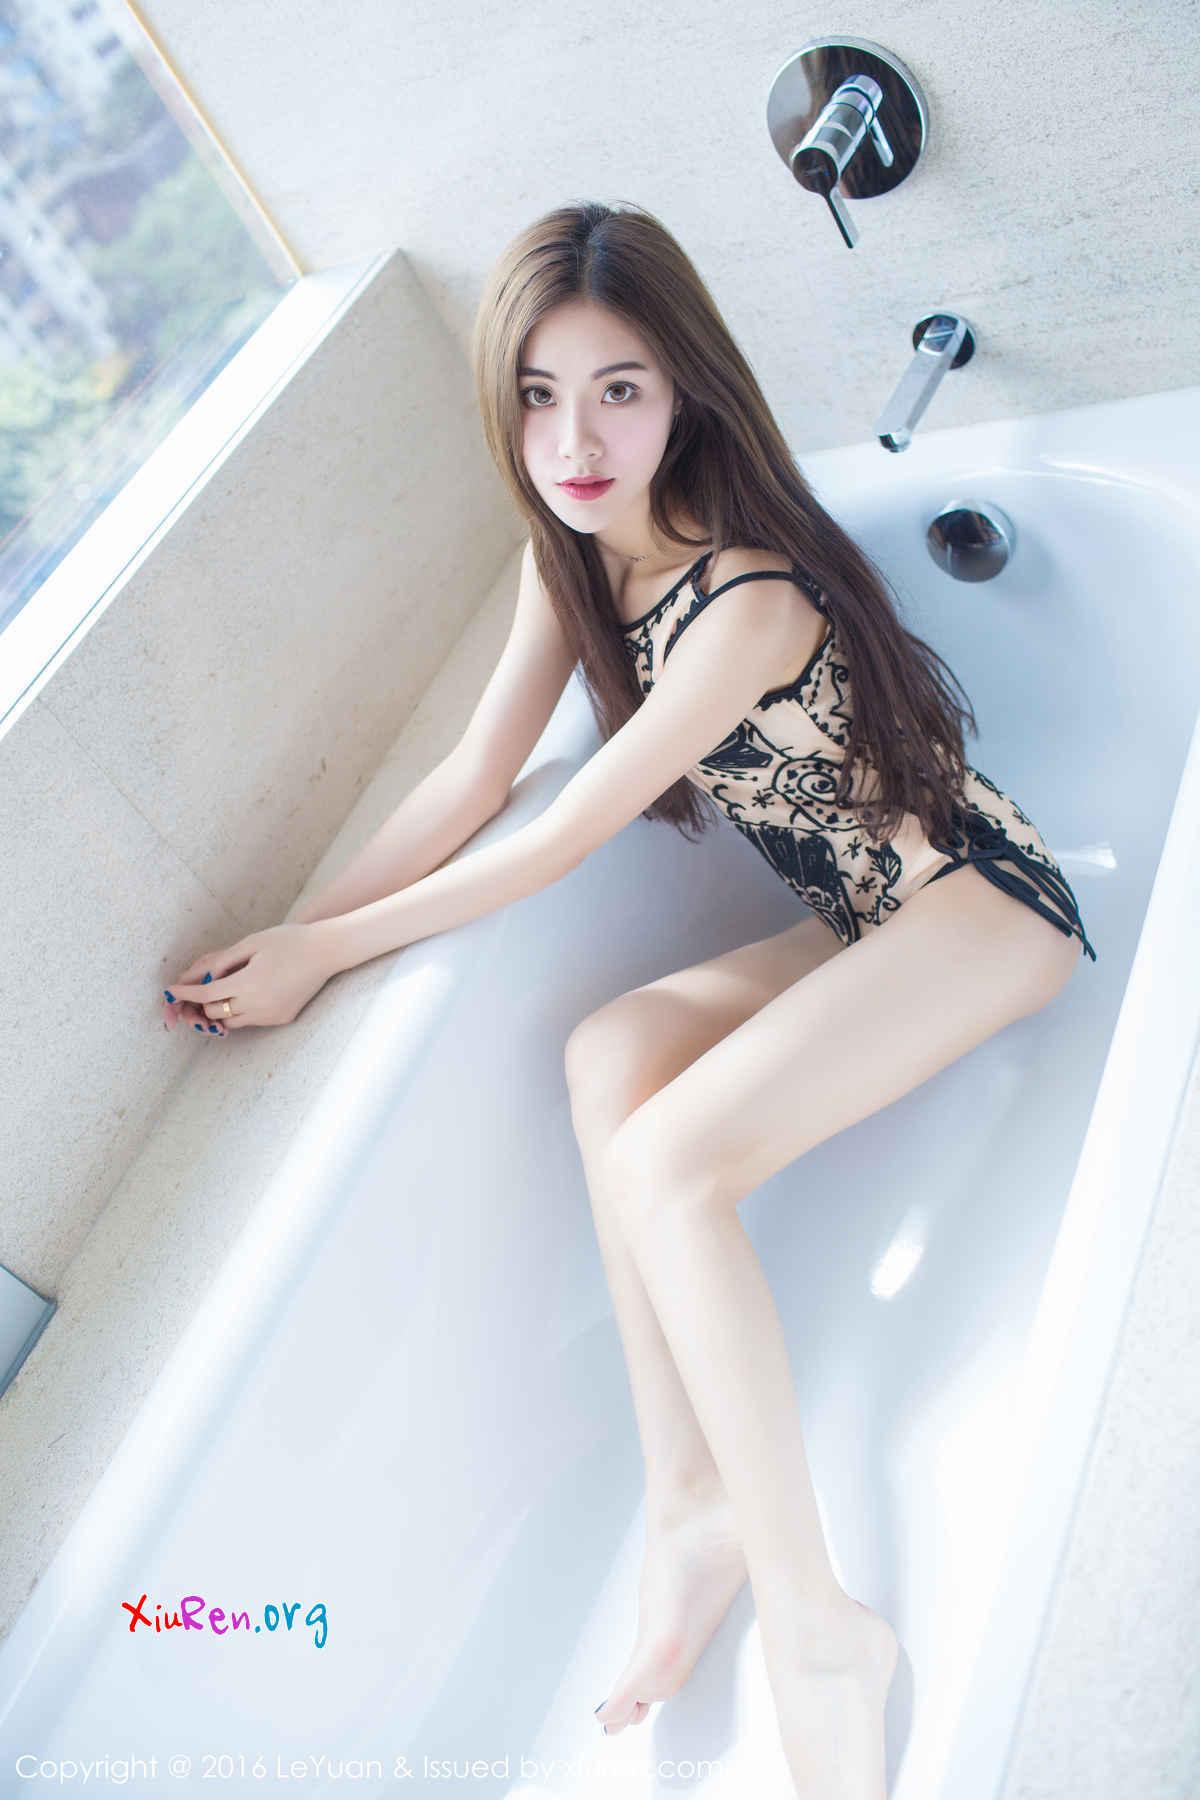 PhimVu Blog: Tuigirl No.054 - Hu Yun Er 胡允儿